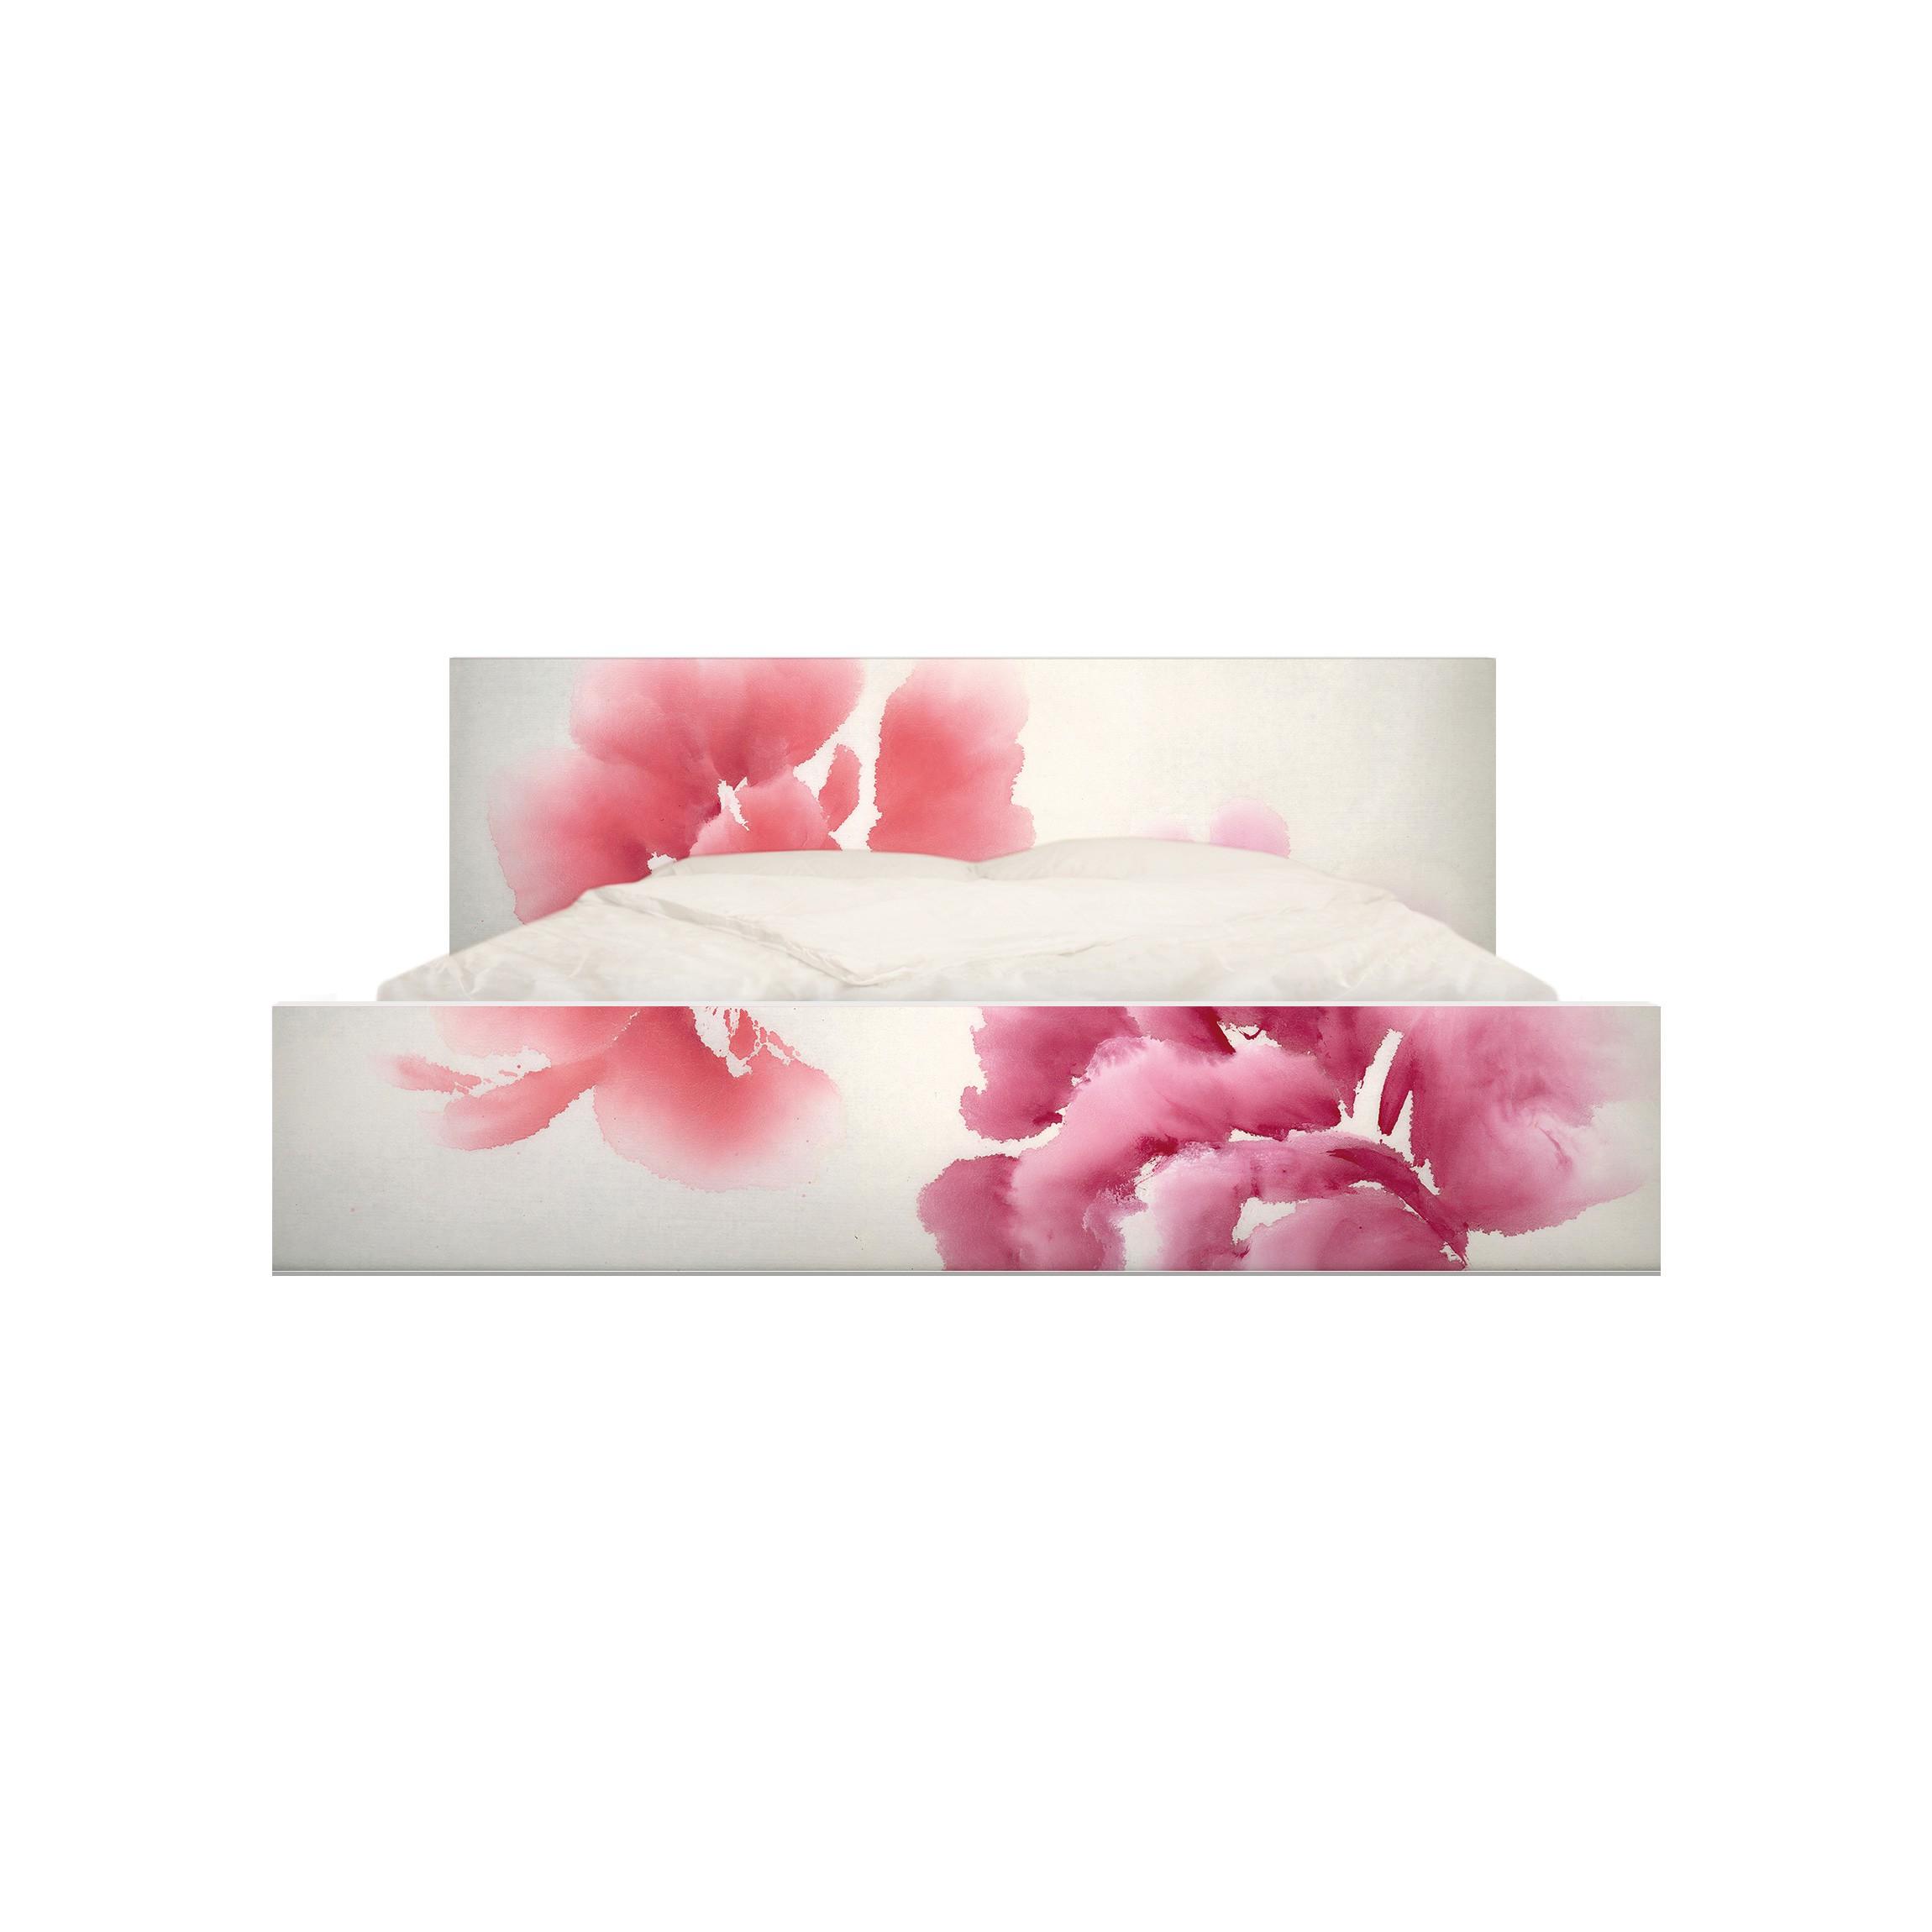 m belfolie f r ikea malm bett niedrig 140x200cm klebefolie k nstlerische flora ii. Black Bedroom Furniture Sets. Home Design Ideas